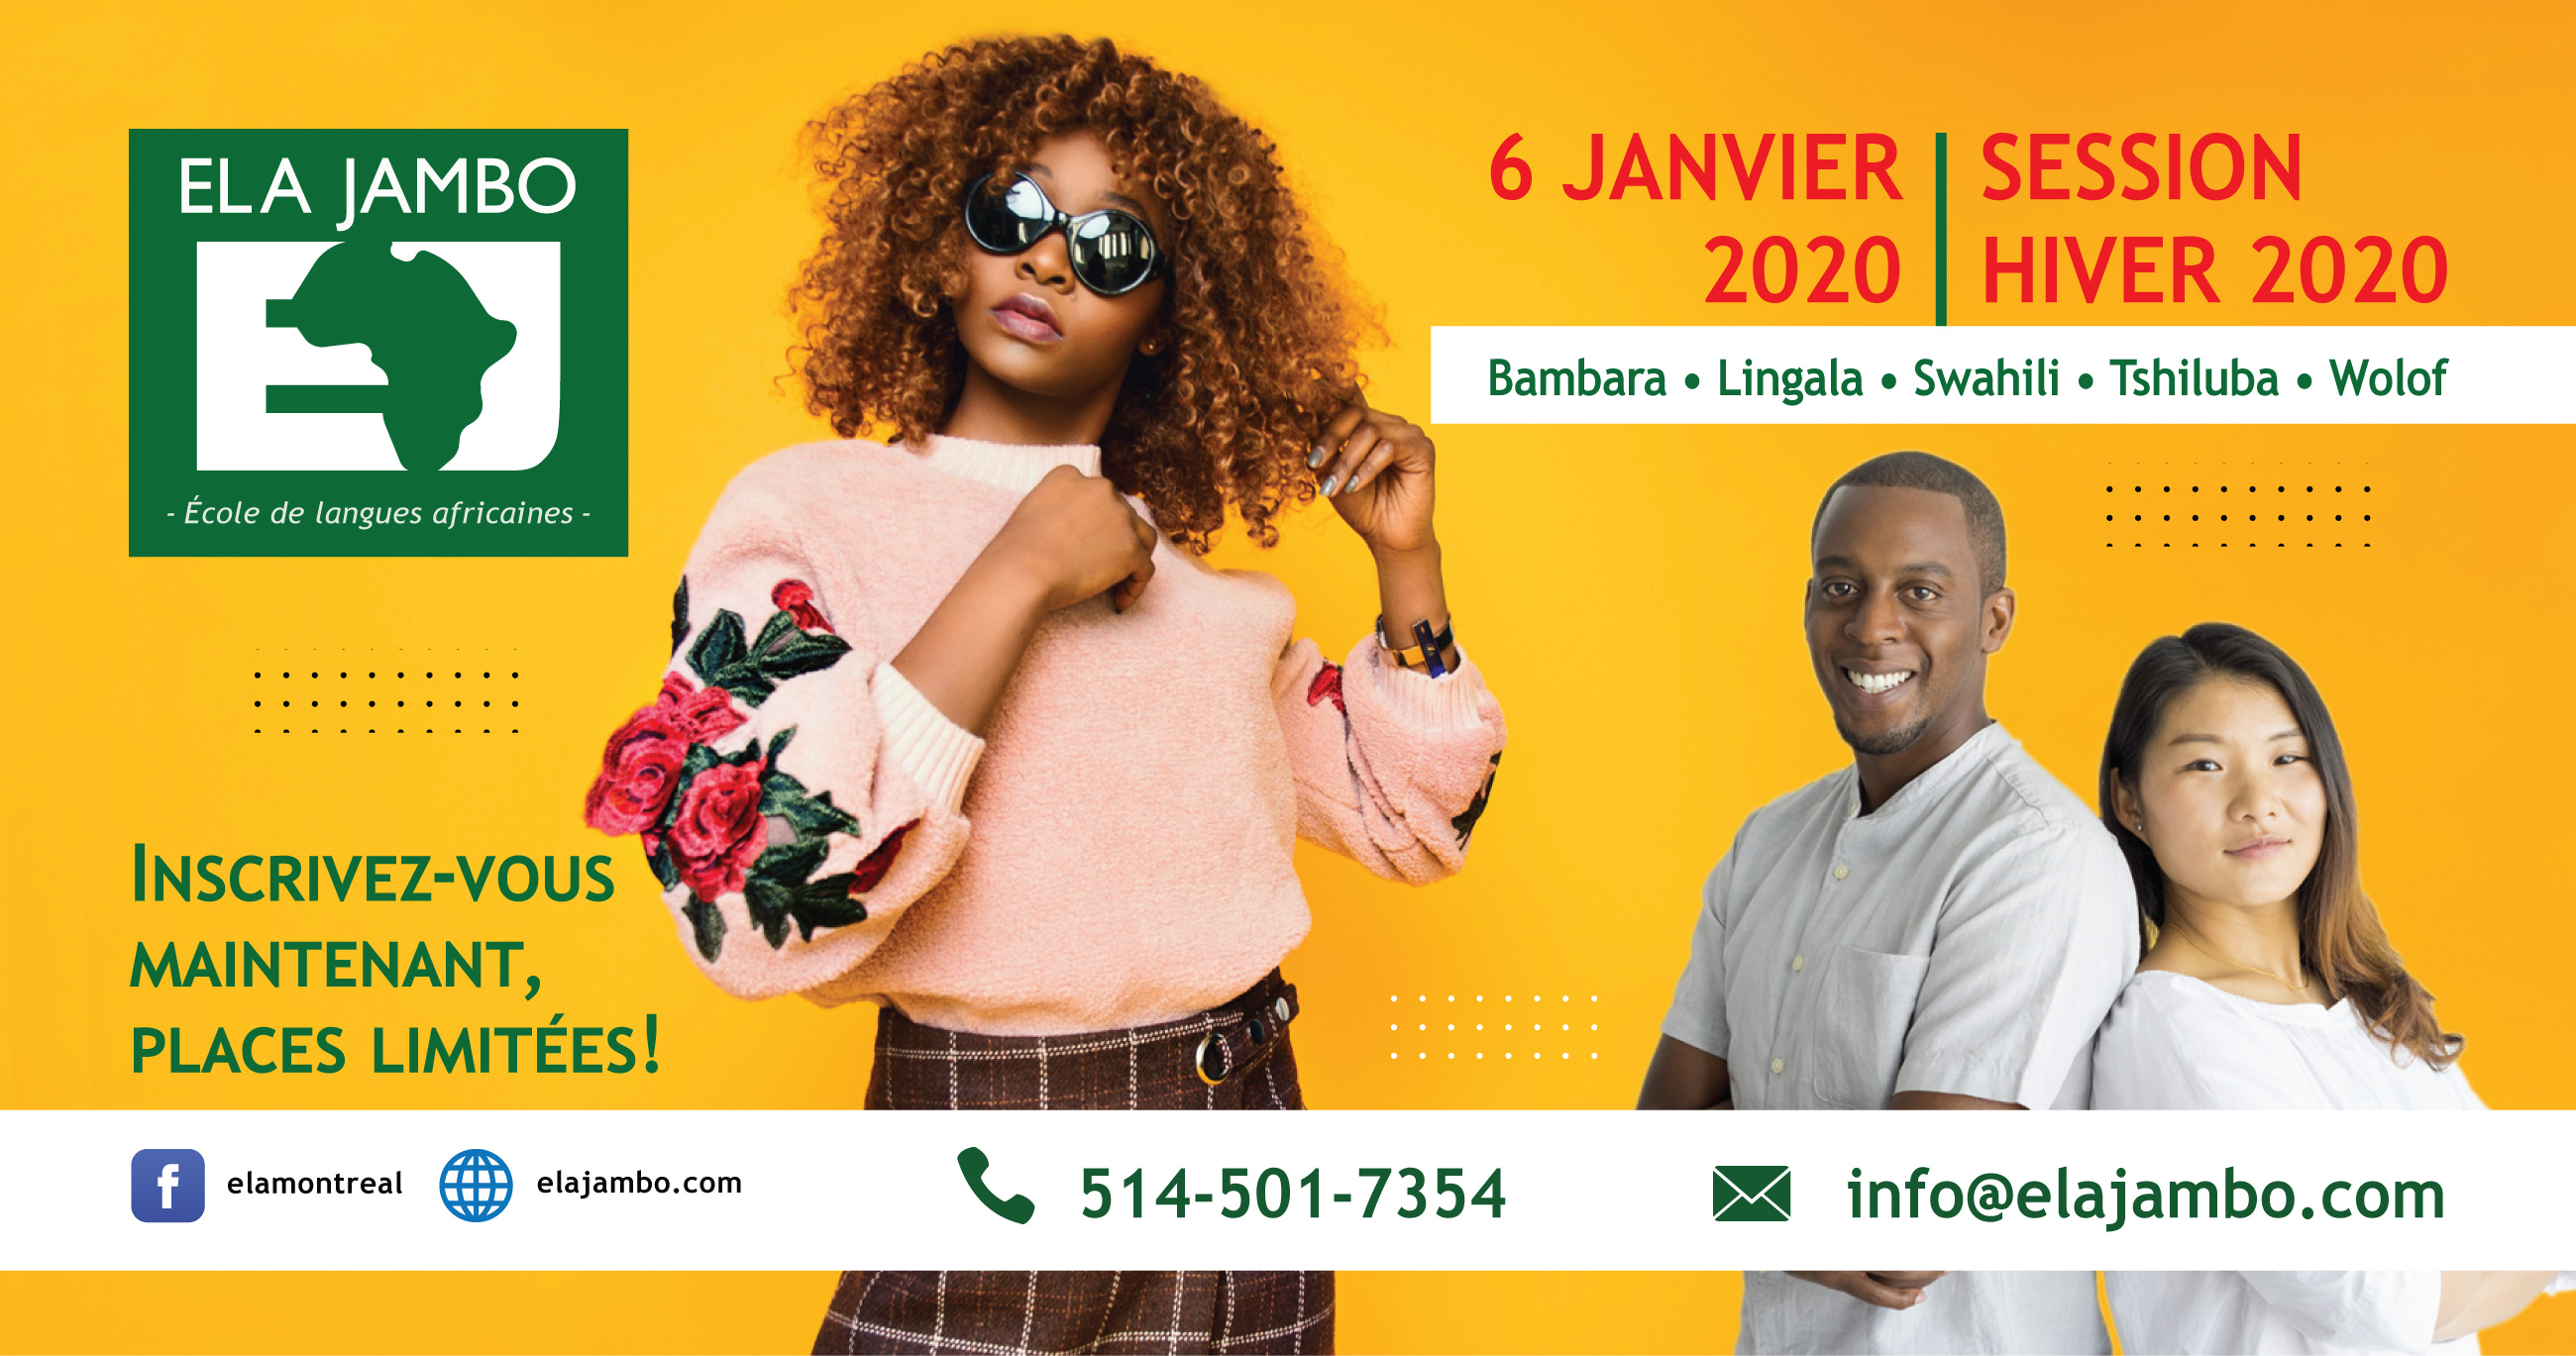 ELA JAMBO – Session Hiver 2020